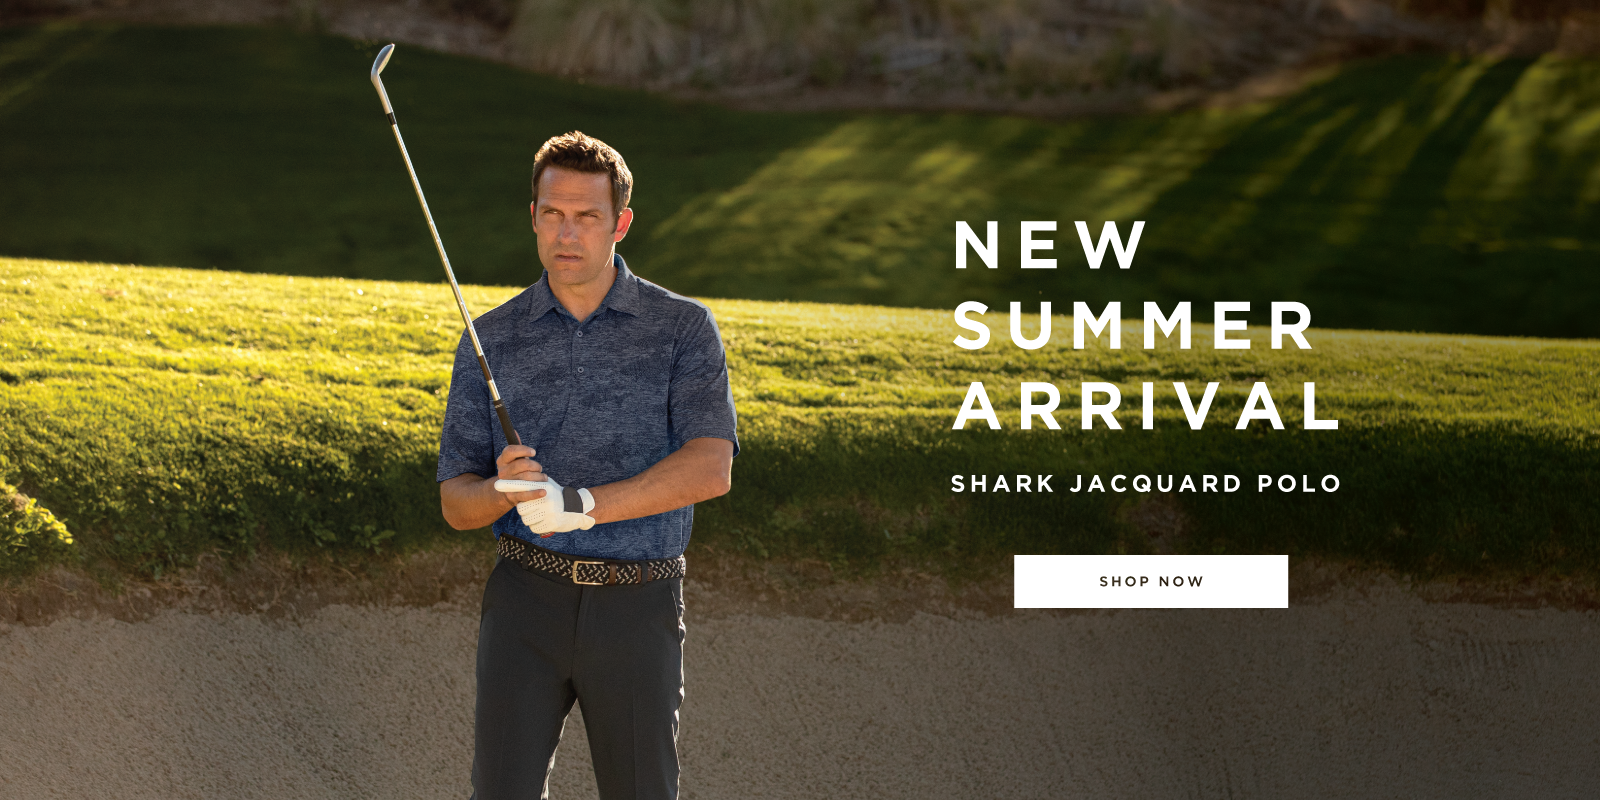 New Summer Arrival Shark Jacquard Polo Shop Now